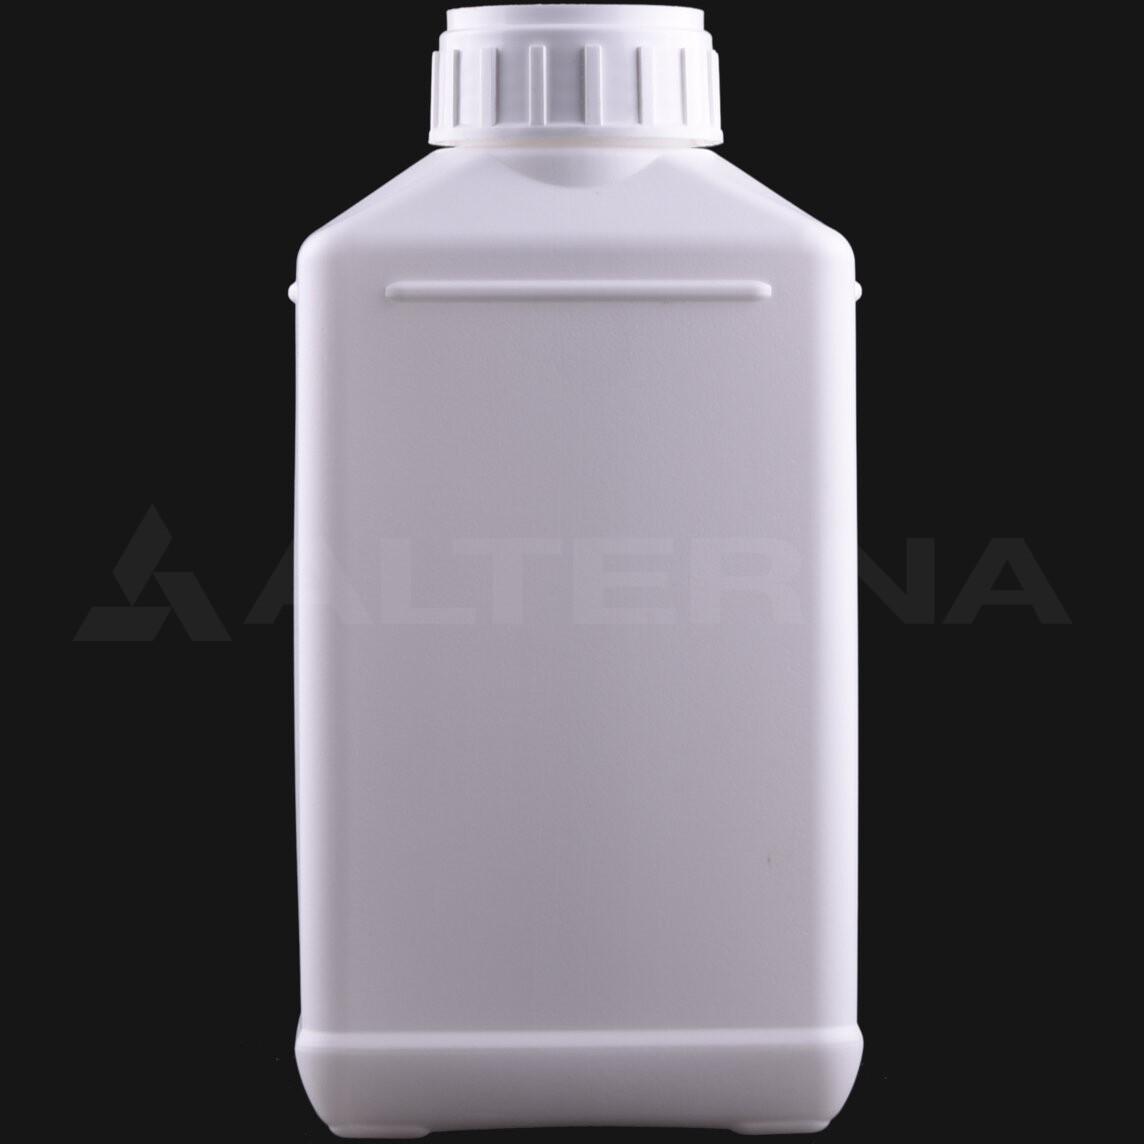 1000 ml HDPE Rectangular Bottle with 50 mm Alu. Foil Seal Cap